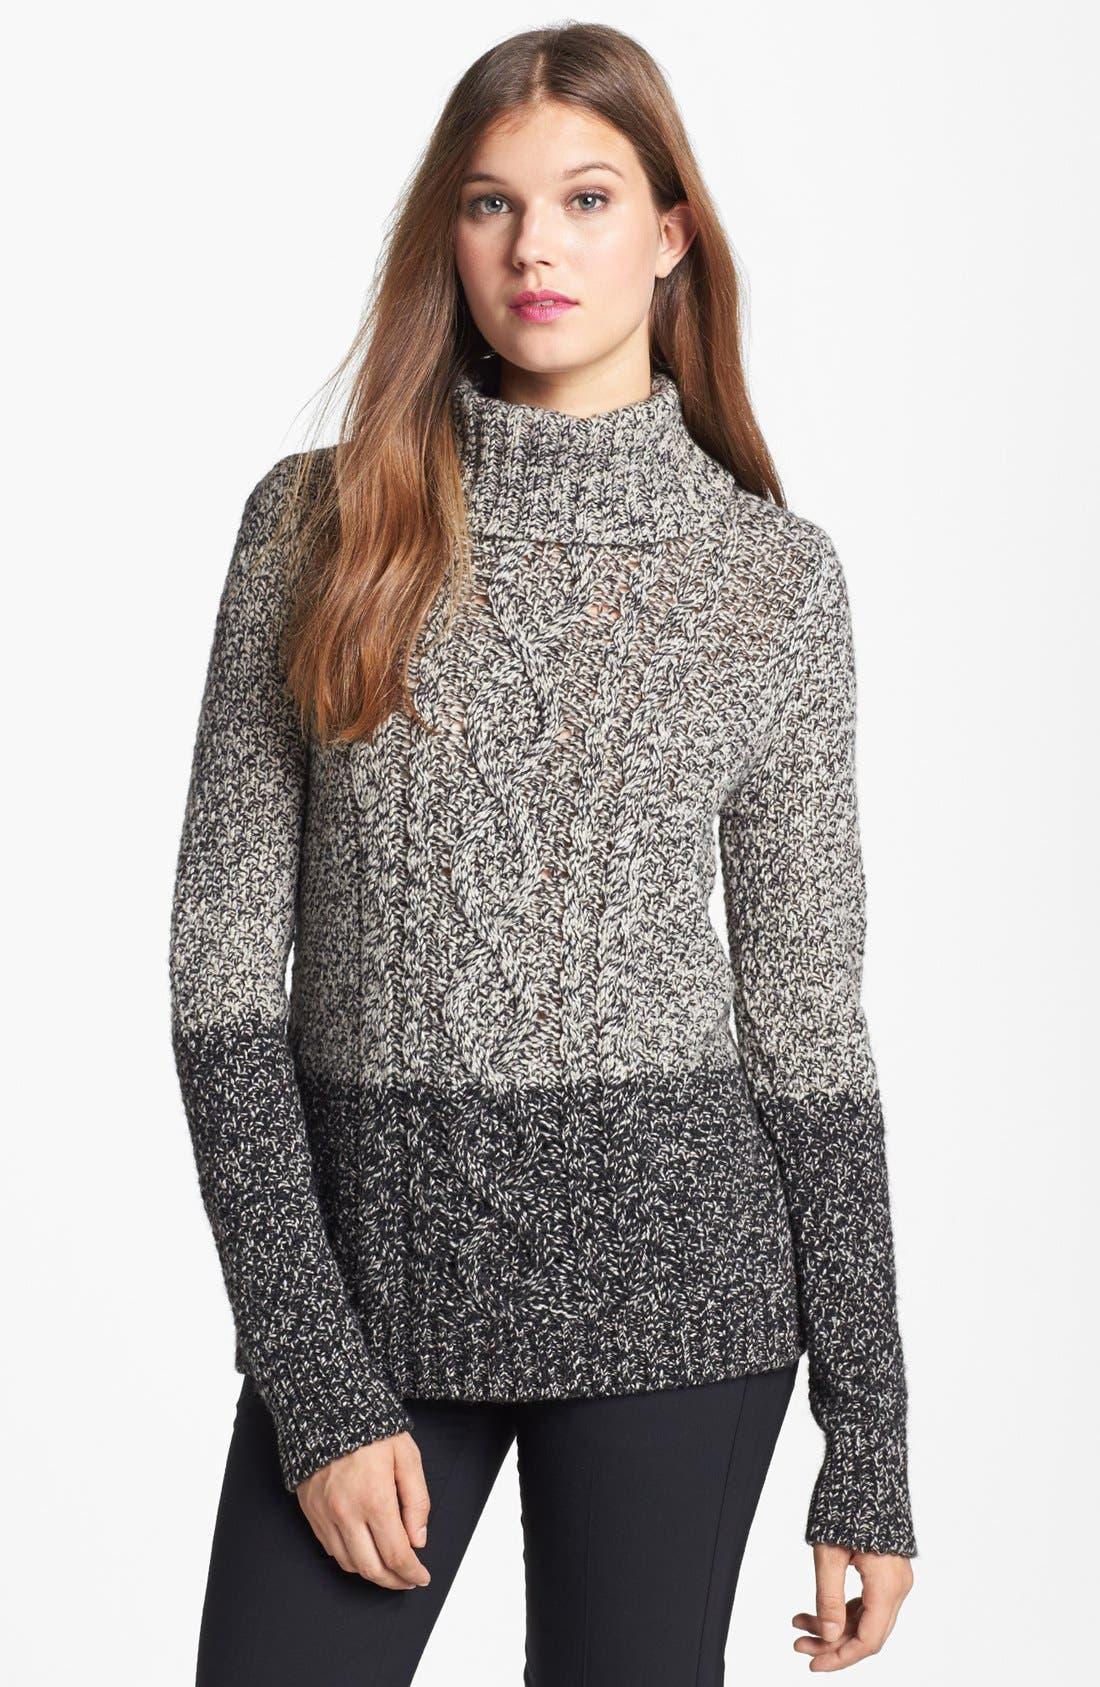 Colorblock Turtleneck Sweater,                             Main thumbnail 1, color,                             020